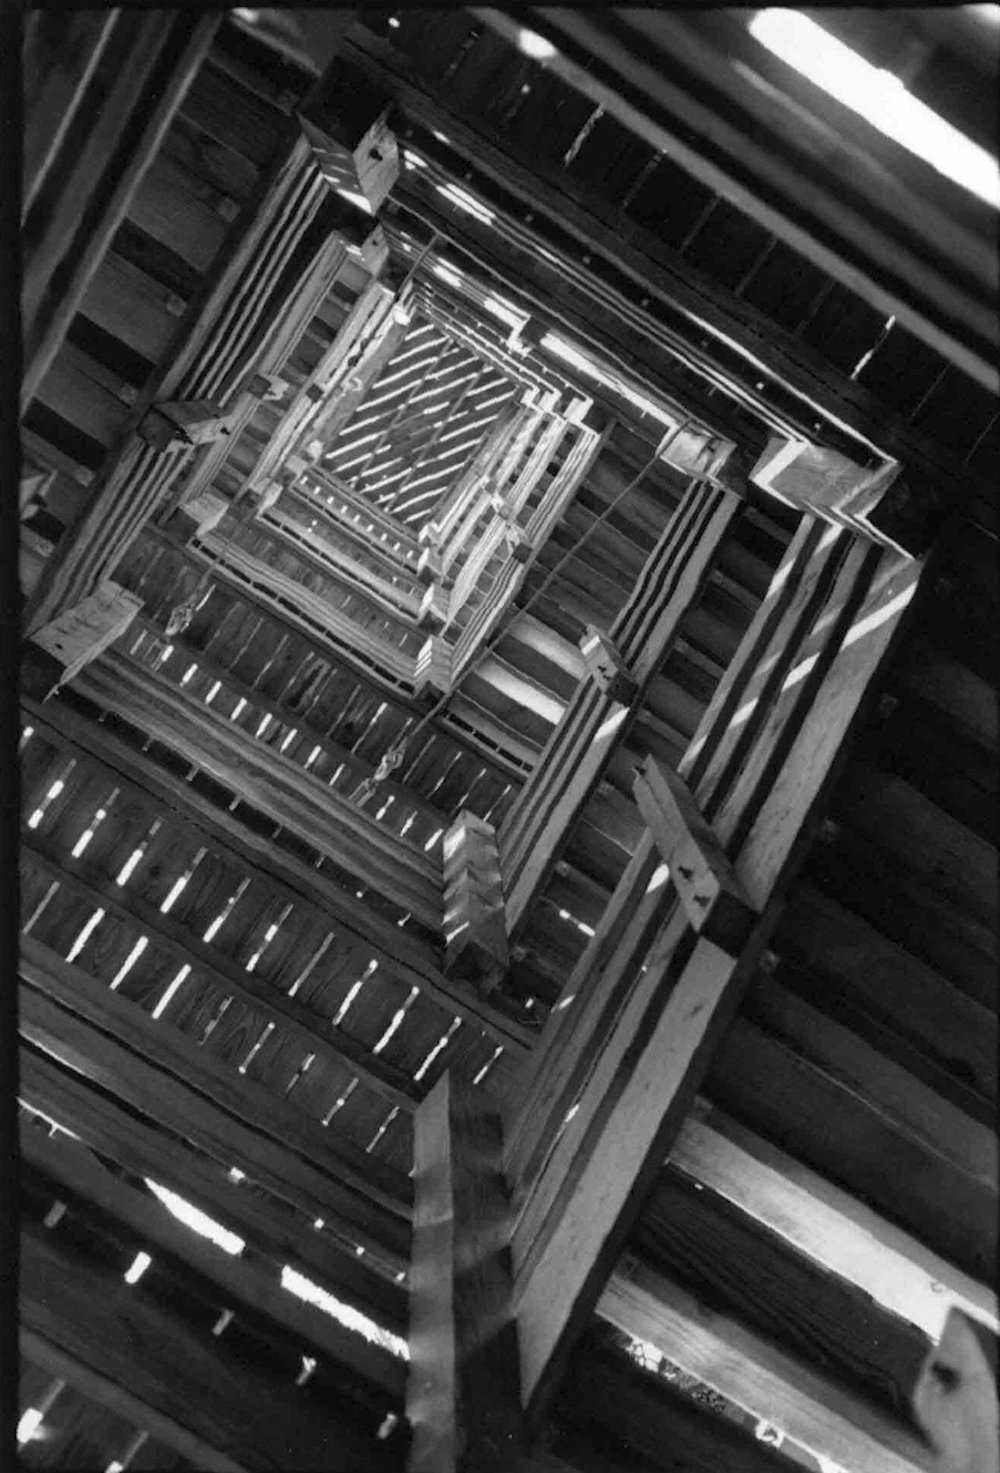 Myakka Staircase, Silver Gelatin Print